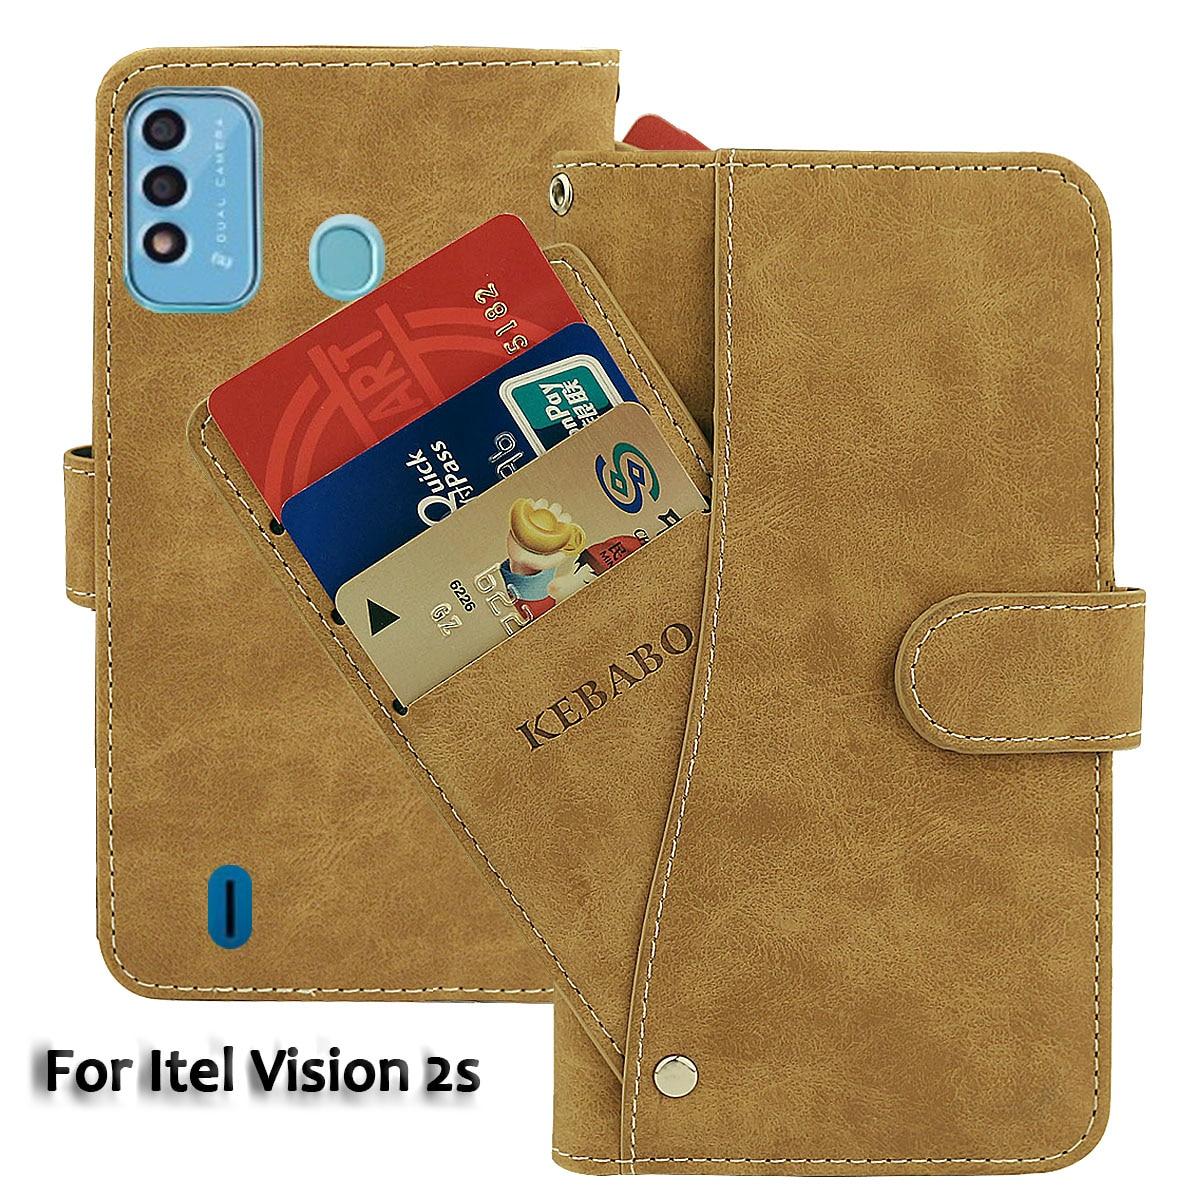 Vintage Leather Wallet Itel Vision 2s Case 6.52